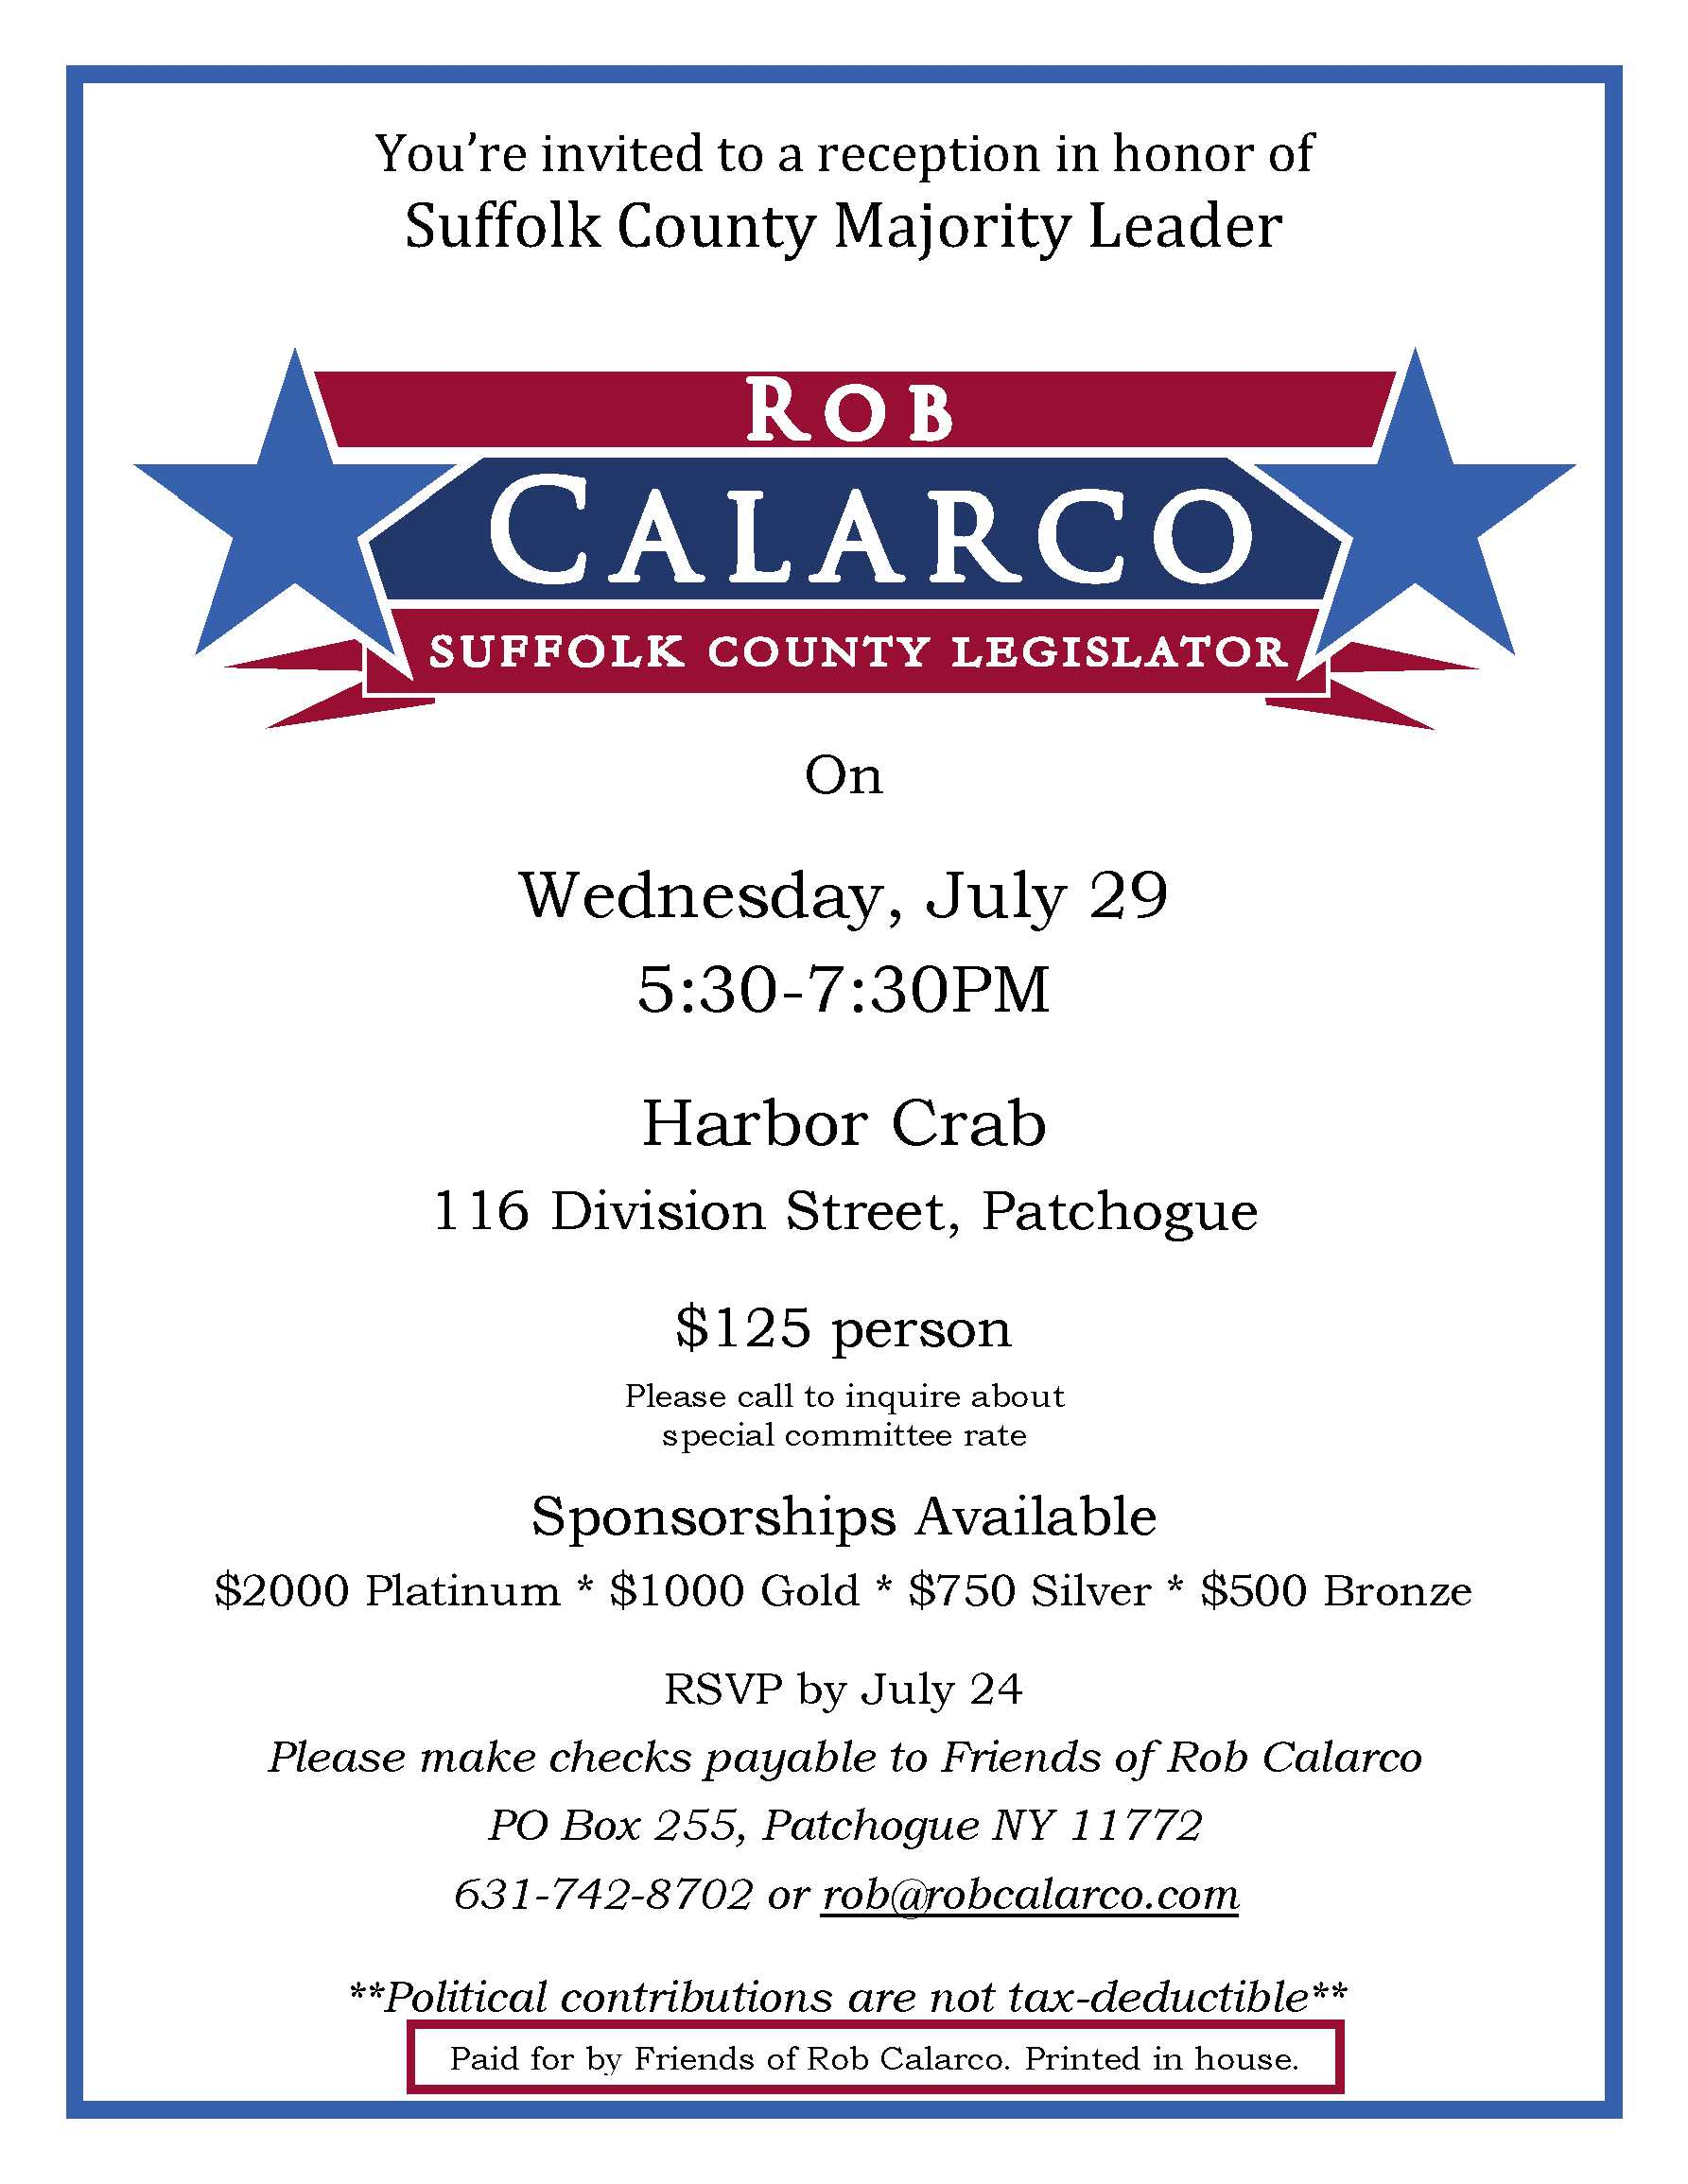 07-29-15_calarco_event_1.jpg